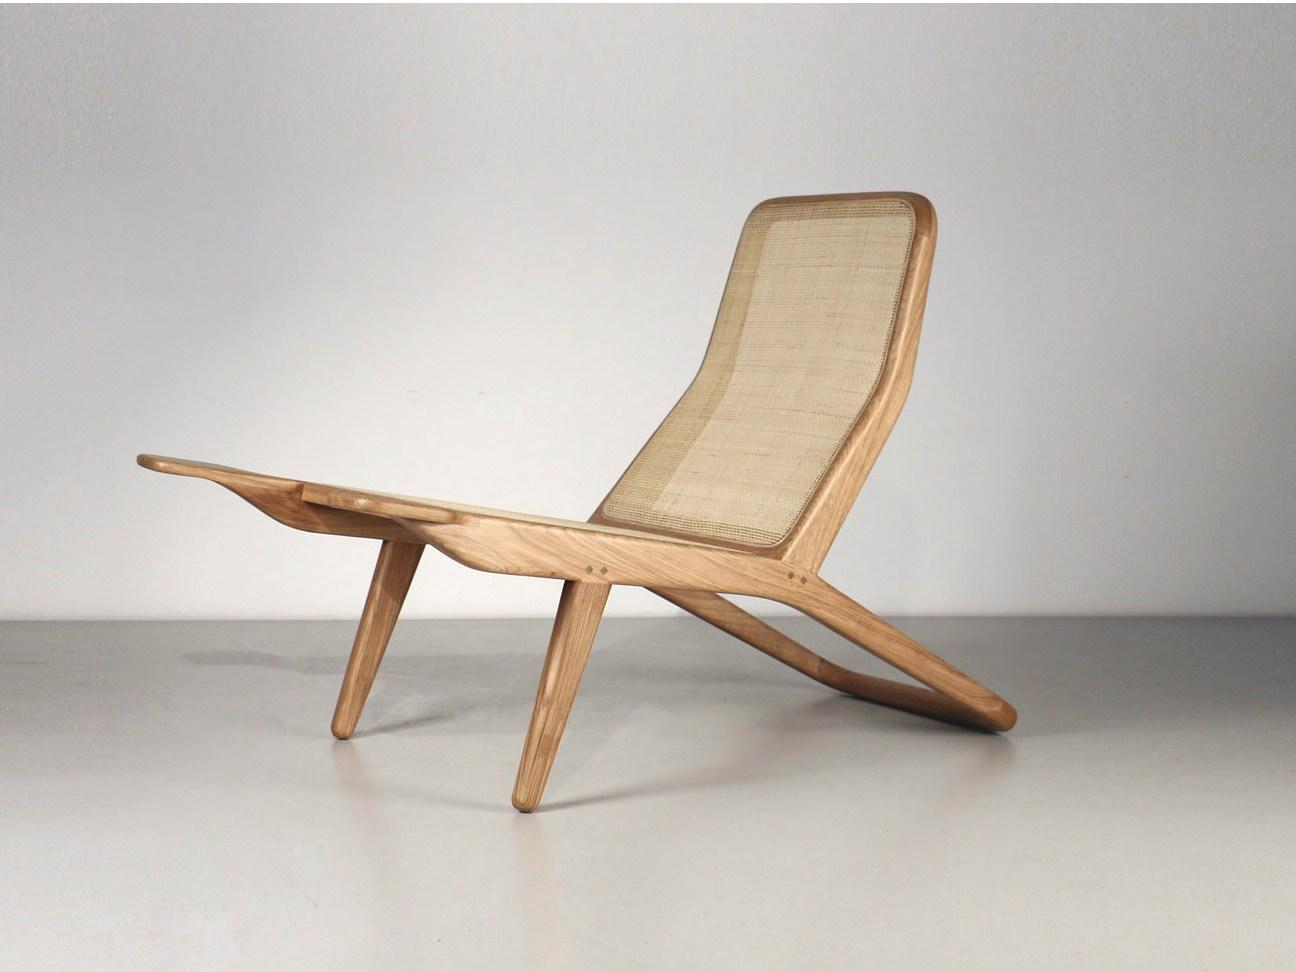 Phenomenal Barca Lounge Chair By Branca Lisboa Sohomod Blog Theyellowbook Wood Chair Design Ideas Theyellowbookinfo